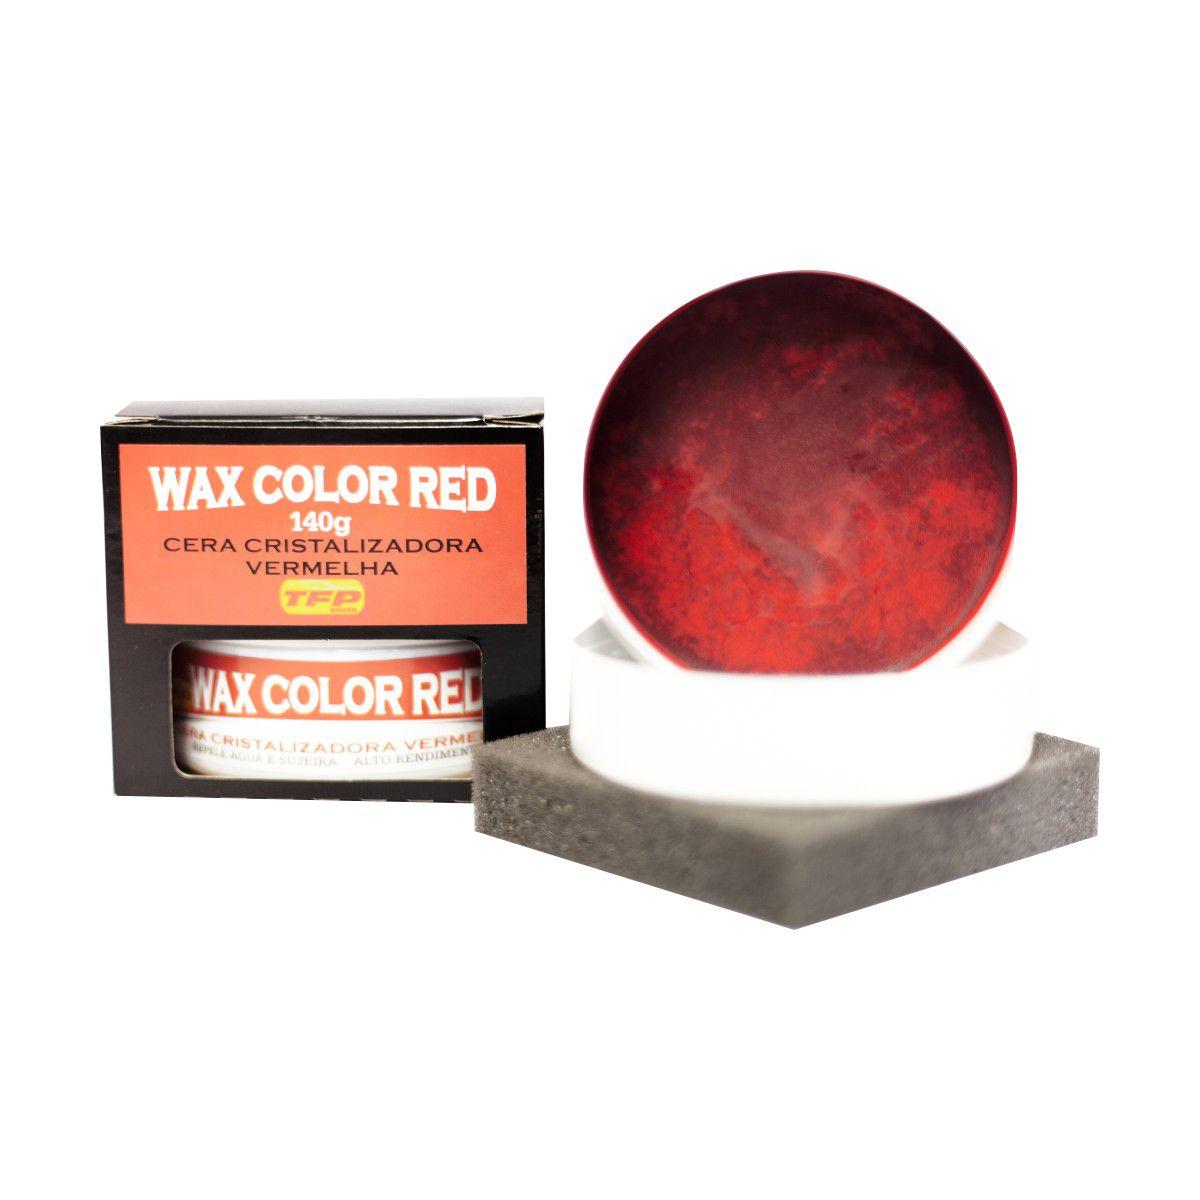 Cera Cristalizadora Wax Color Red + Wax Color Black 140g